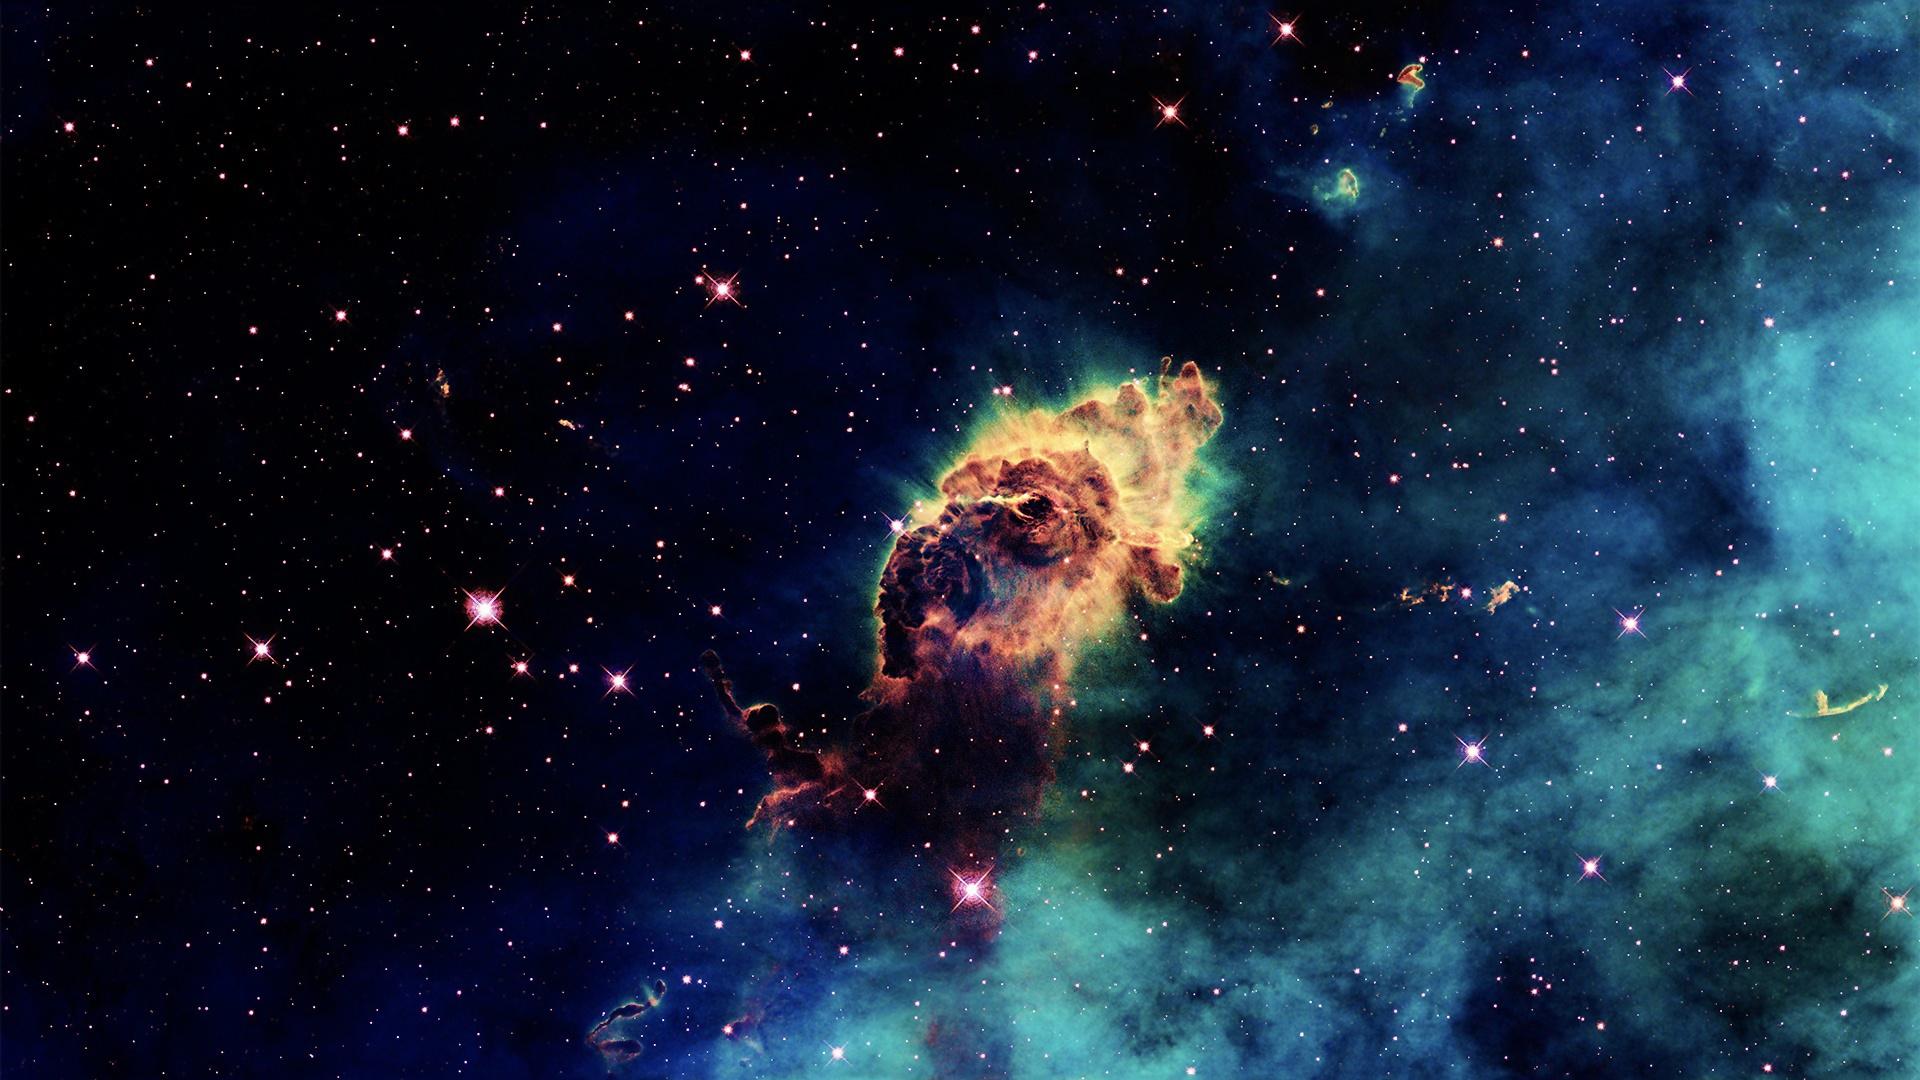 Wallpapers Space Cool Nebula Wallpaper 1920x1080